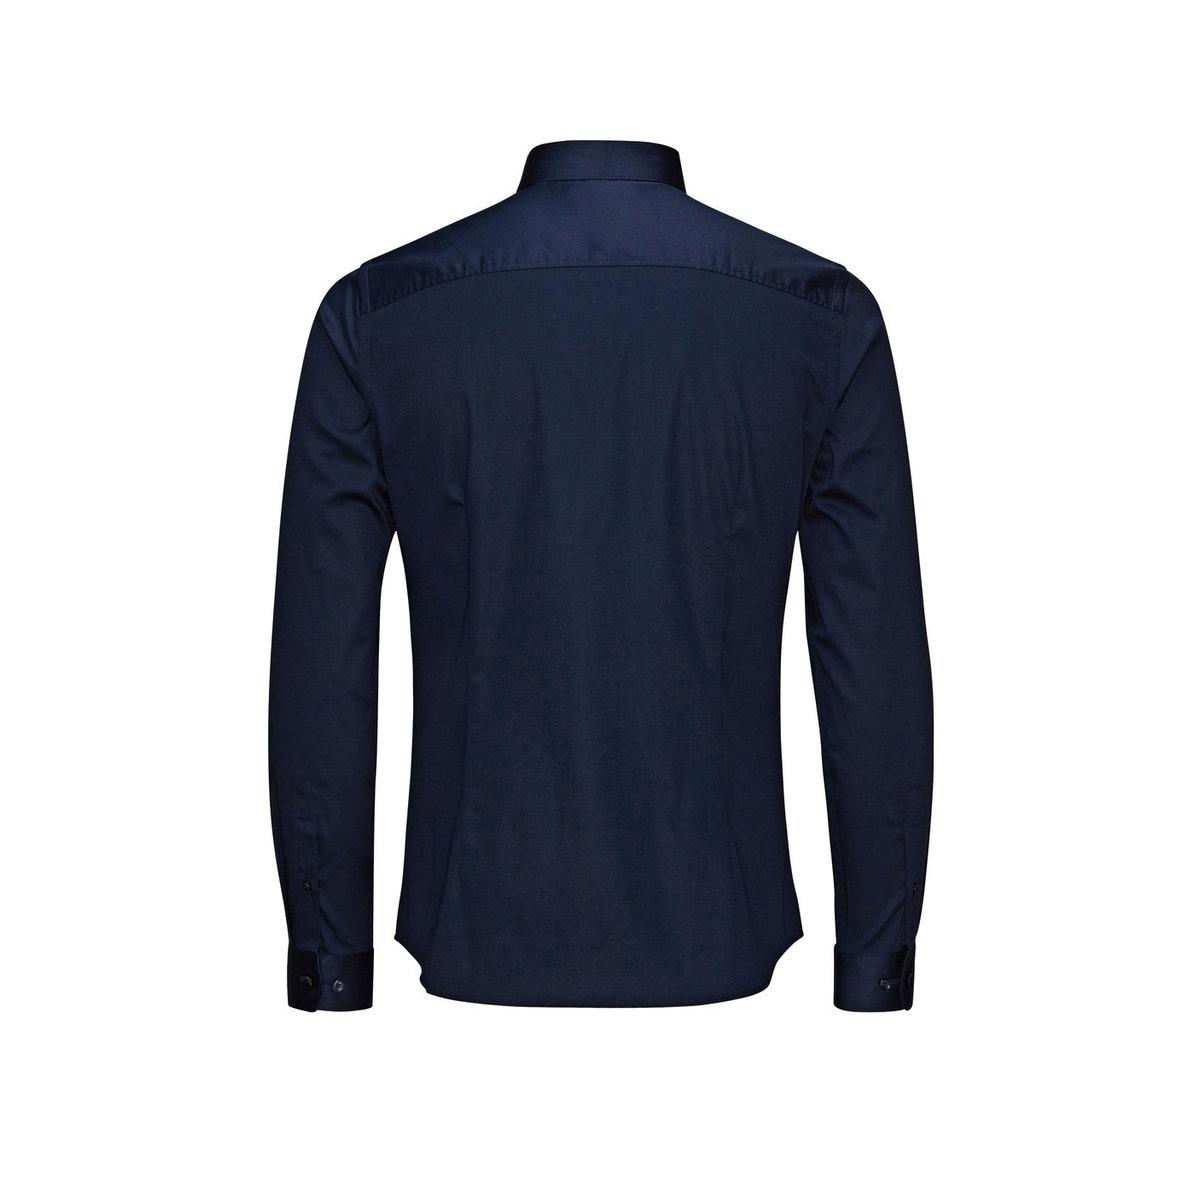 jjprparma shirt 12097662 jack & jones overhemd navy blazer